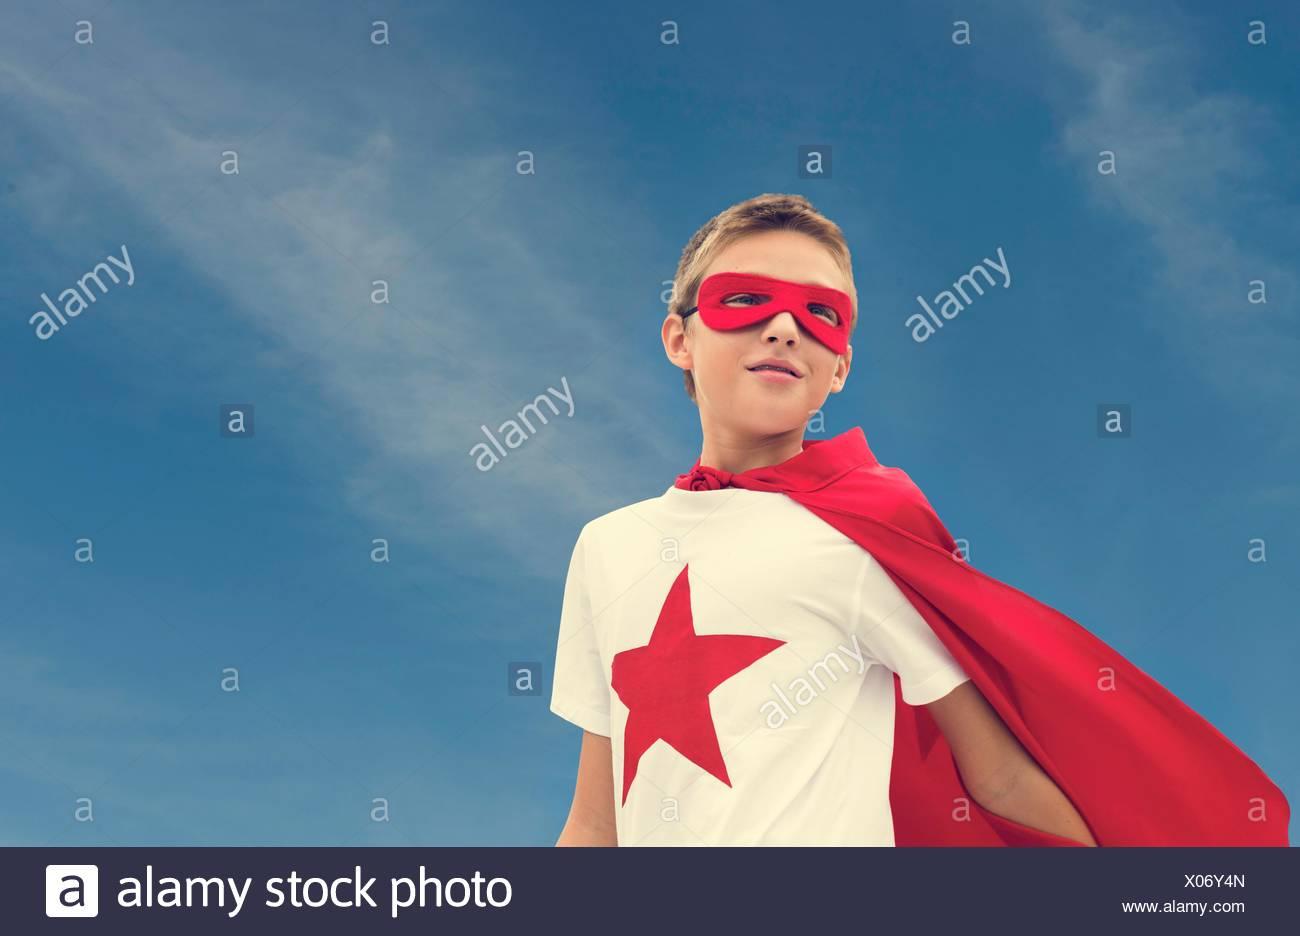 Superheld junge Phantasie Freiheit Glück Konzept Stockbild